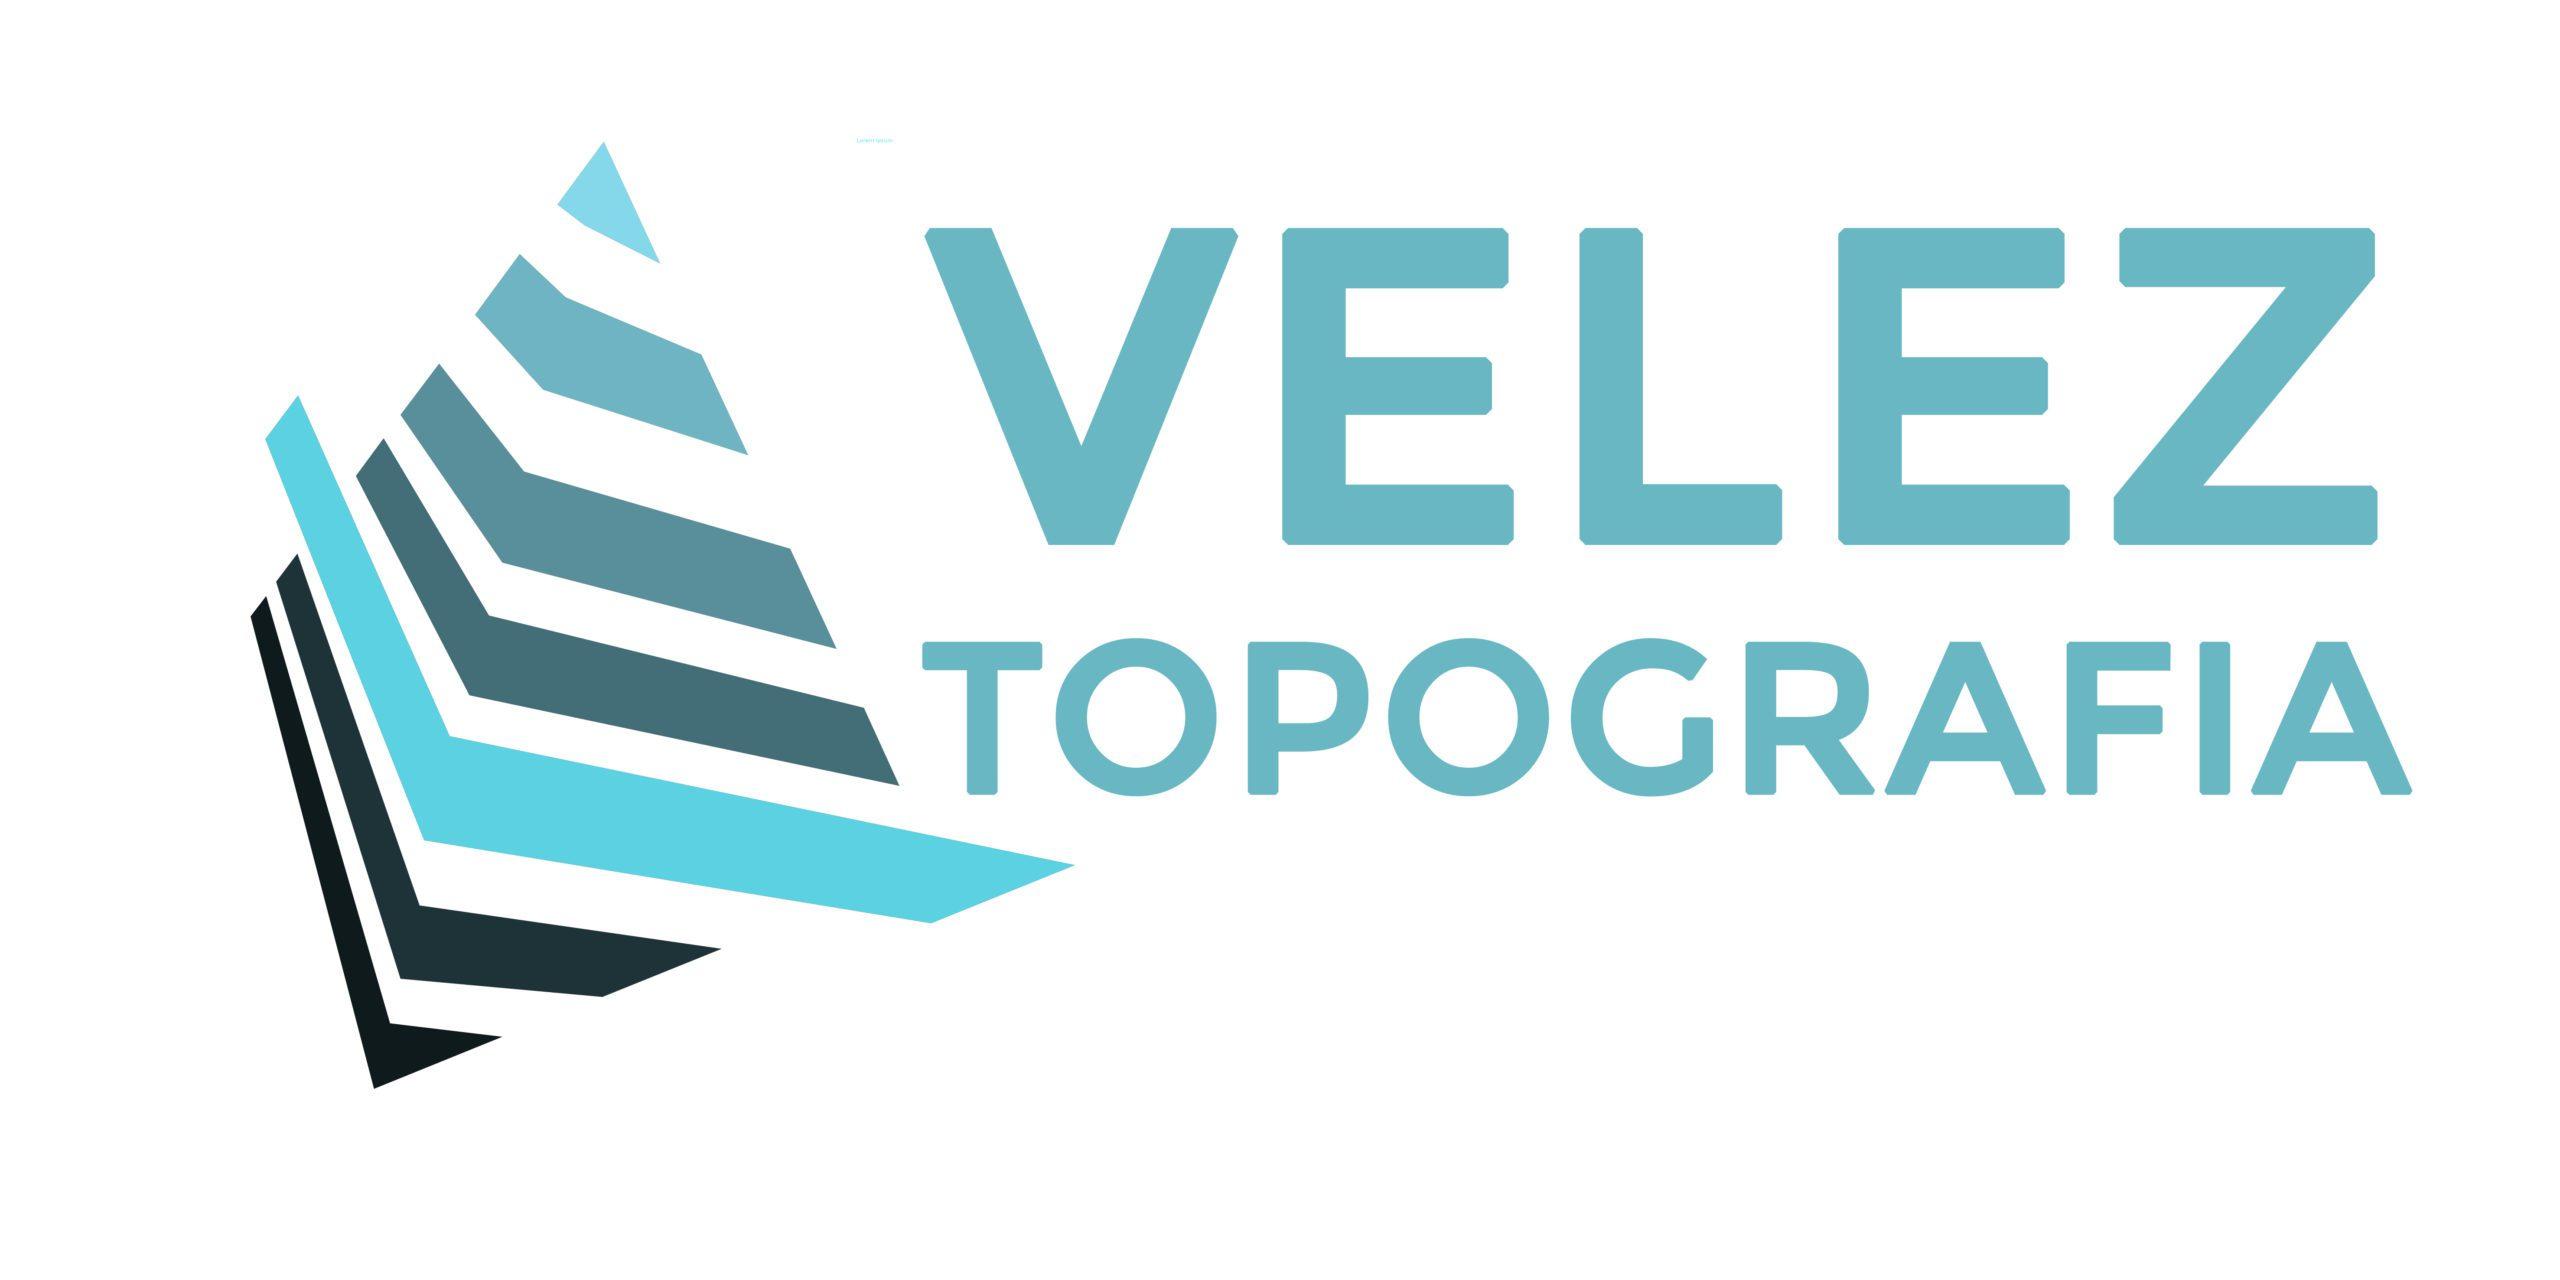 LOGO VELEZTOPOGRAFIA3 scaled